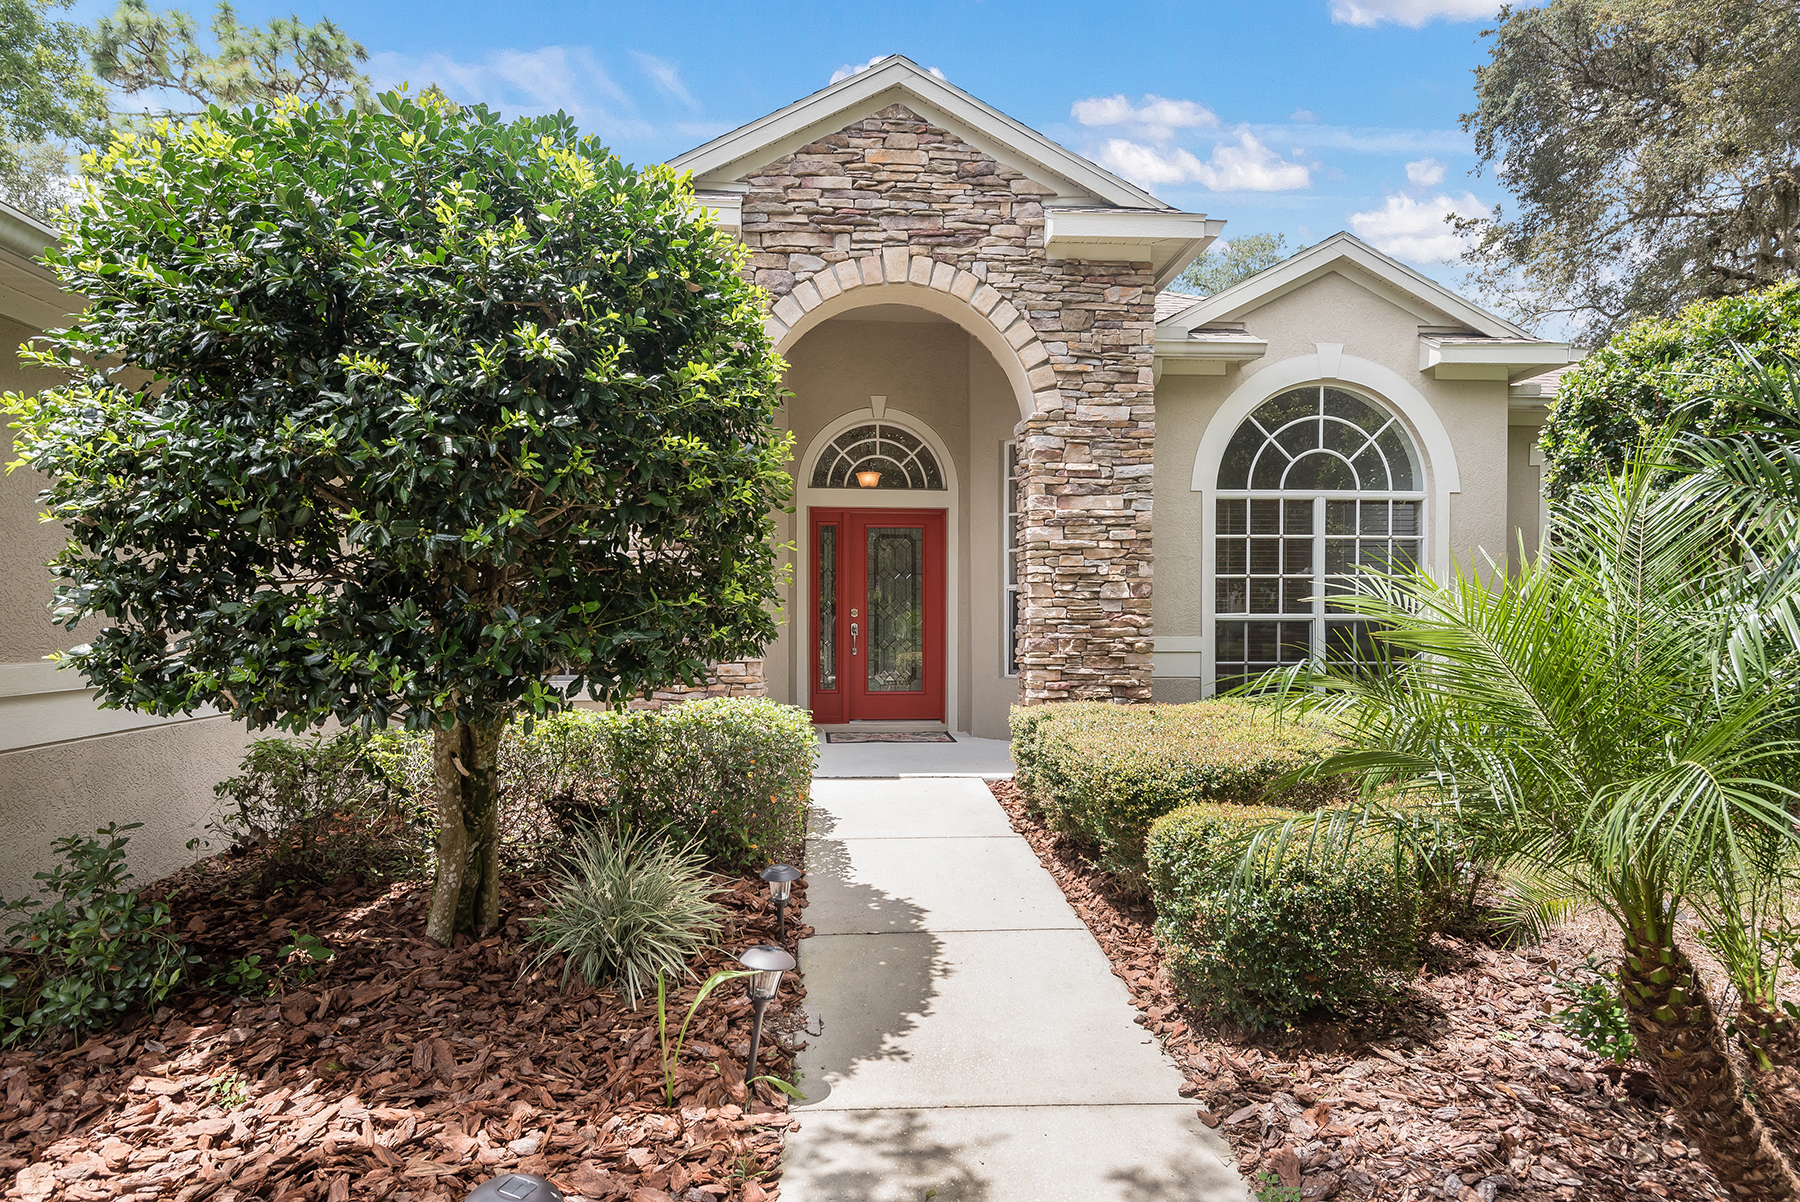 独户住宅 为 销售 在 FISHHAWK RANCH 15935 Sorawater Dr Lithia, 佛罗里达州, 33547 美国